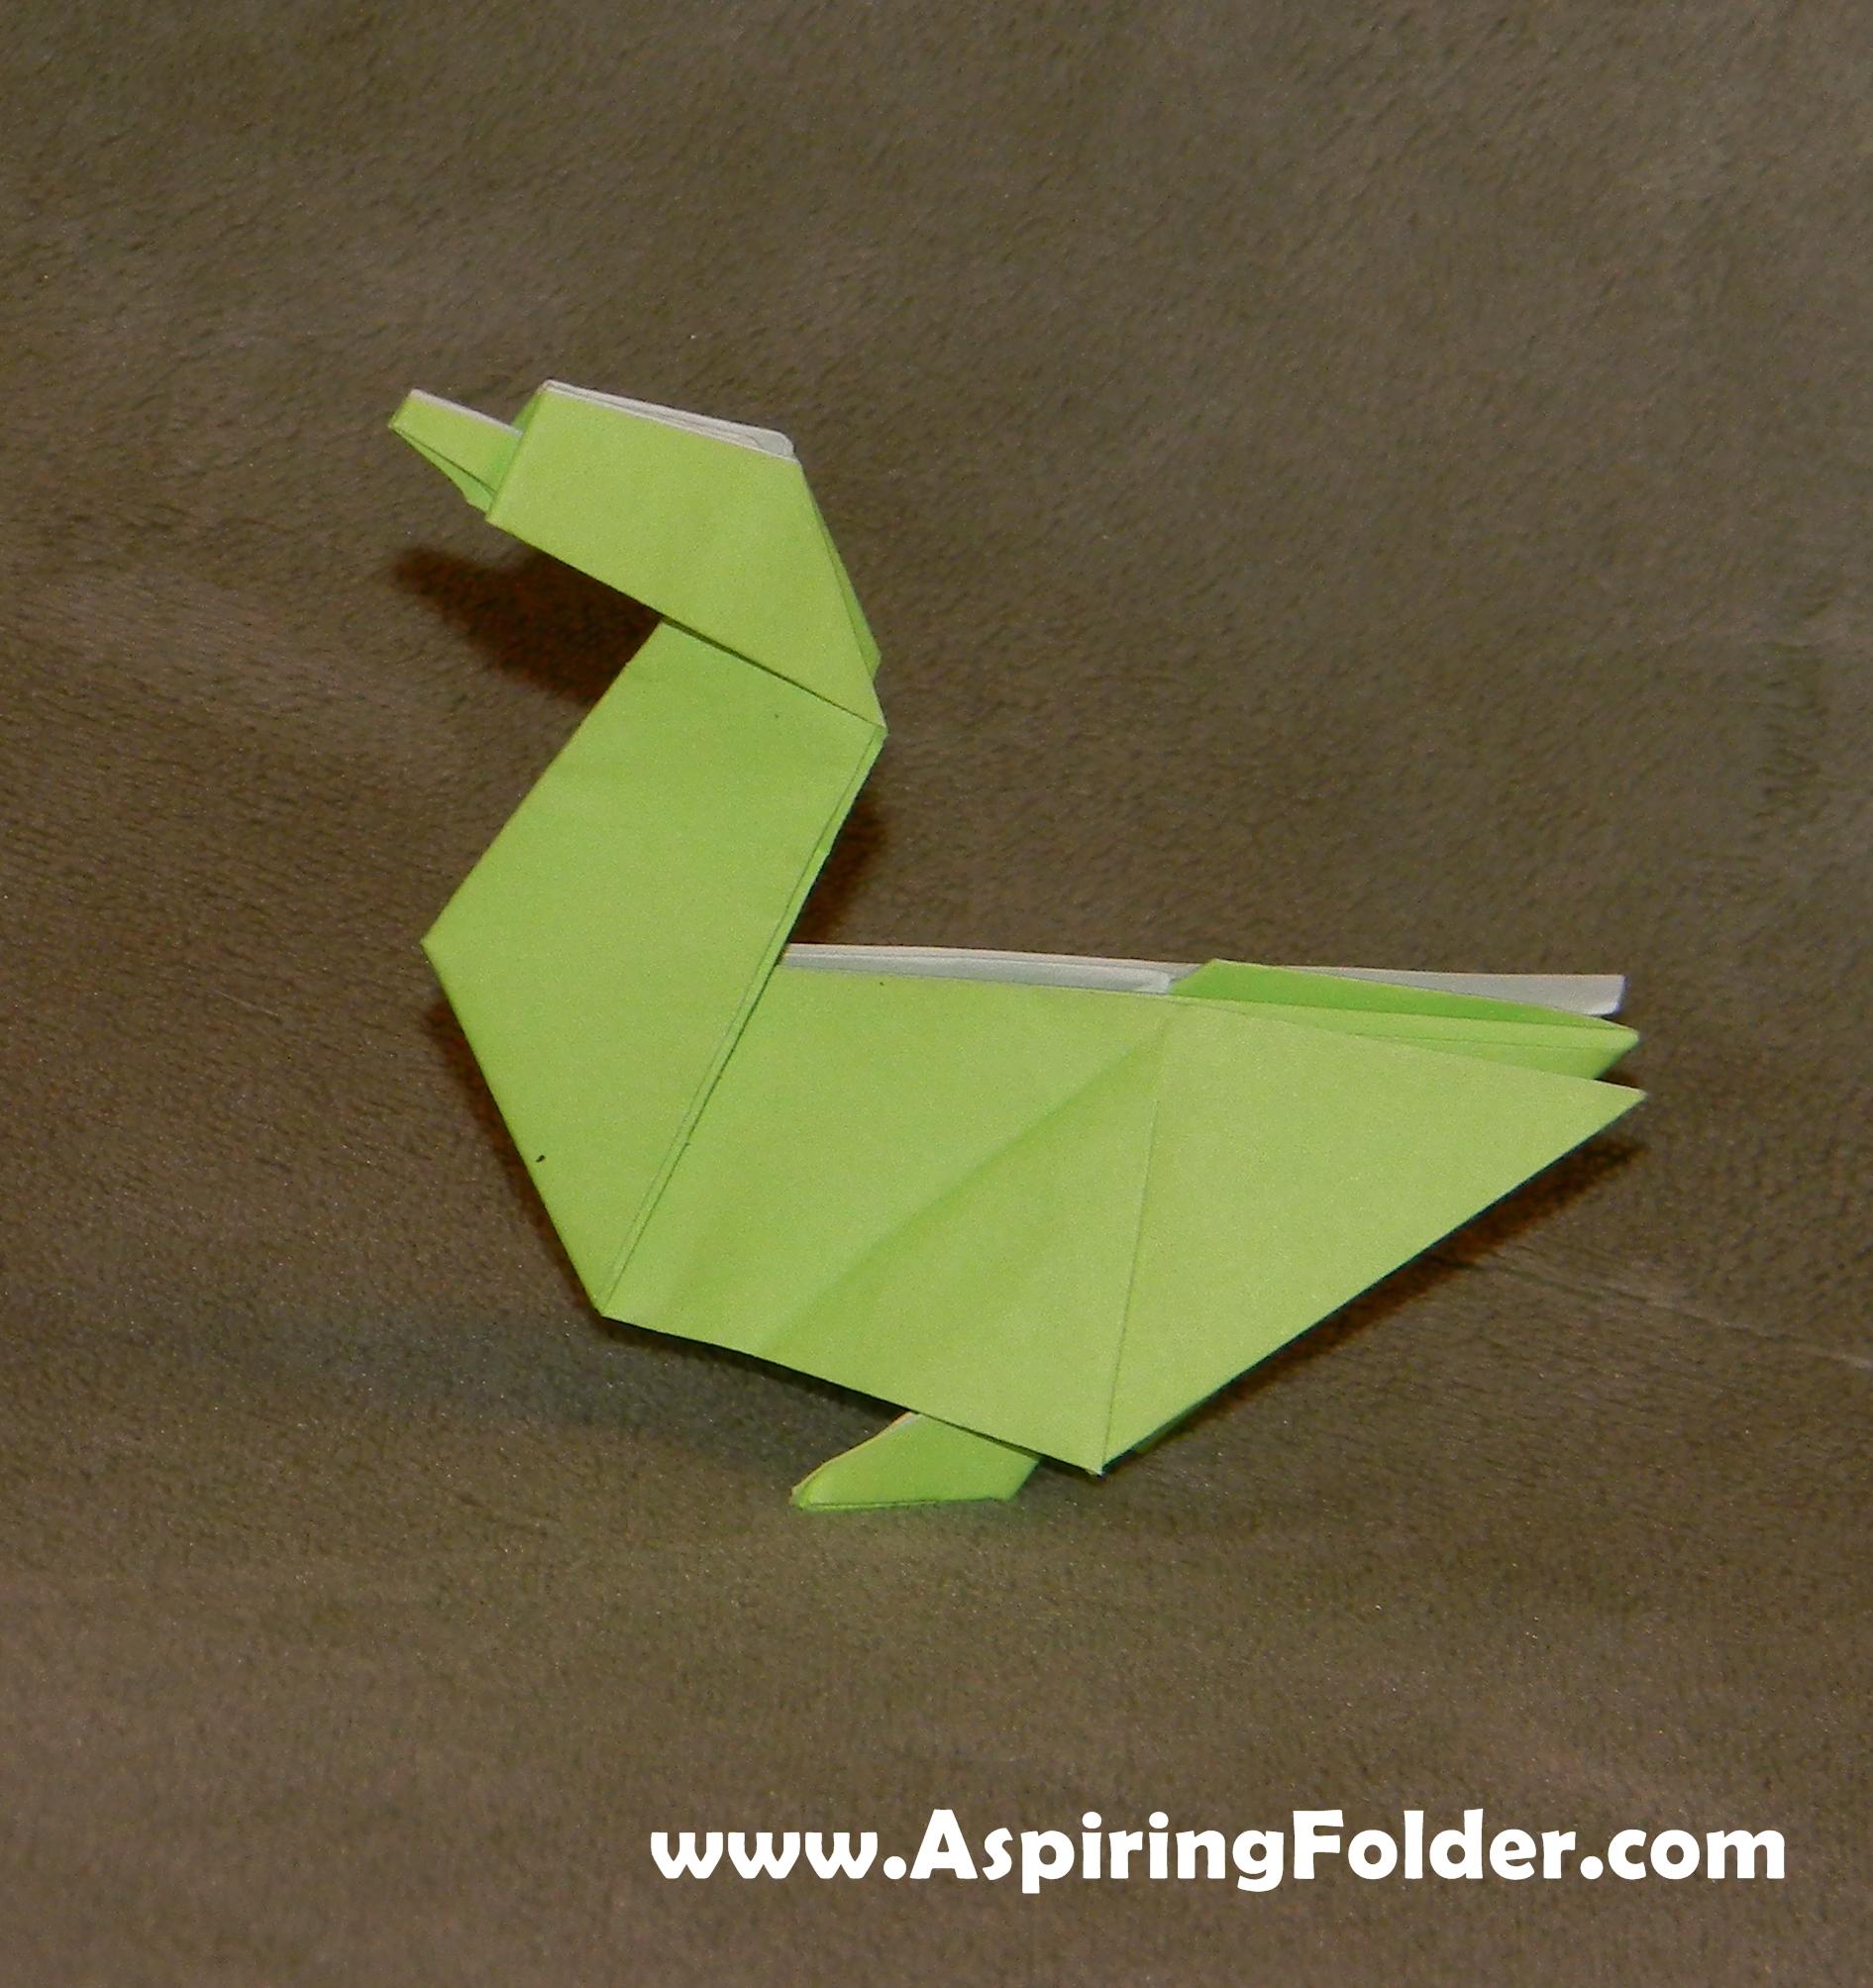 Amazoncom My First Origami Kit Origami Kit with Book